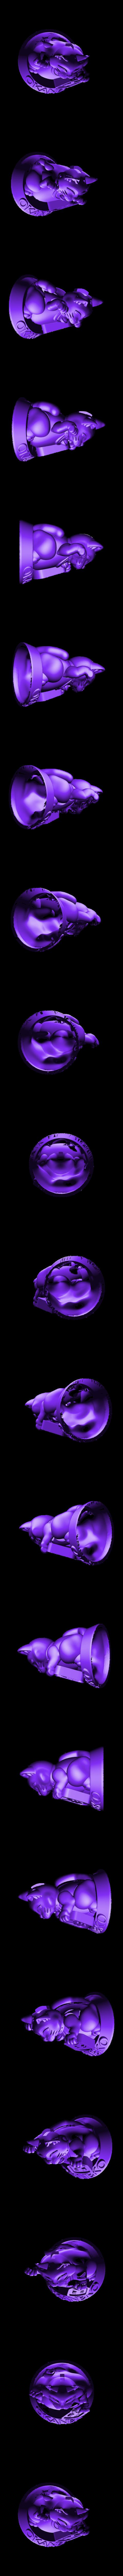 okaneko_top.stl Download free STL file OKANEKO • 3D print model, HeribertoValle